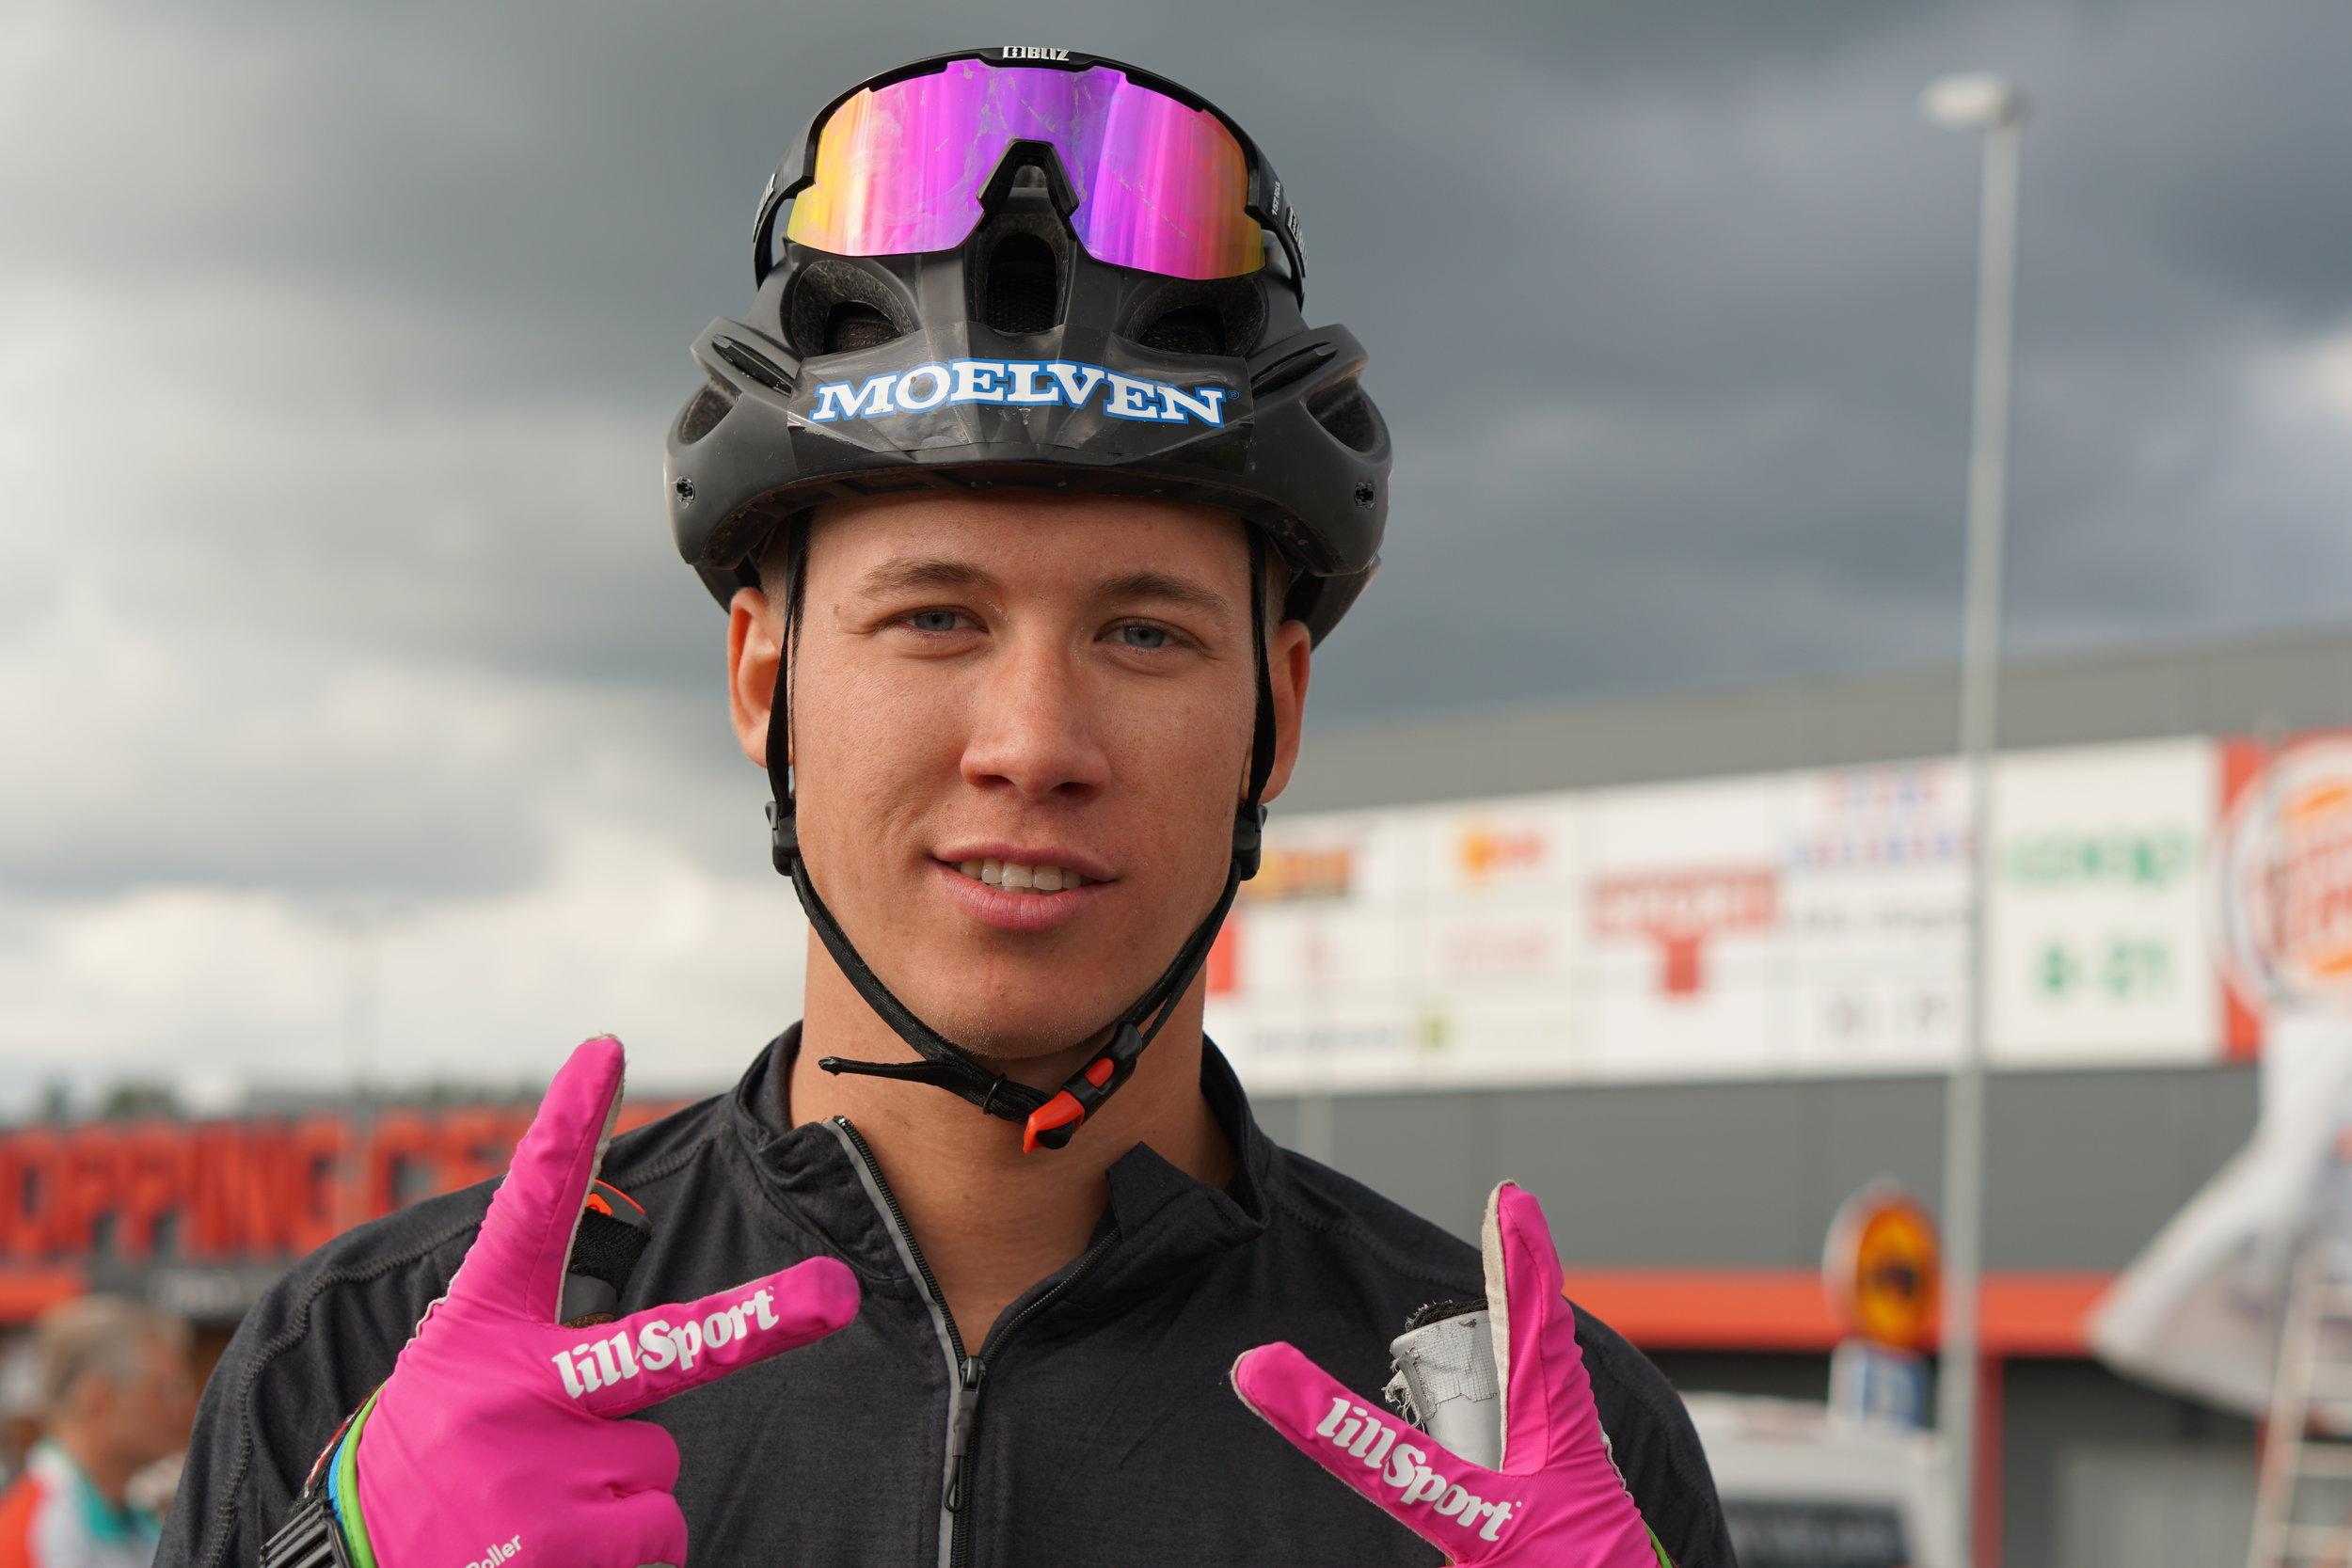 Emil Persson, Lager 157 Ski Team